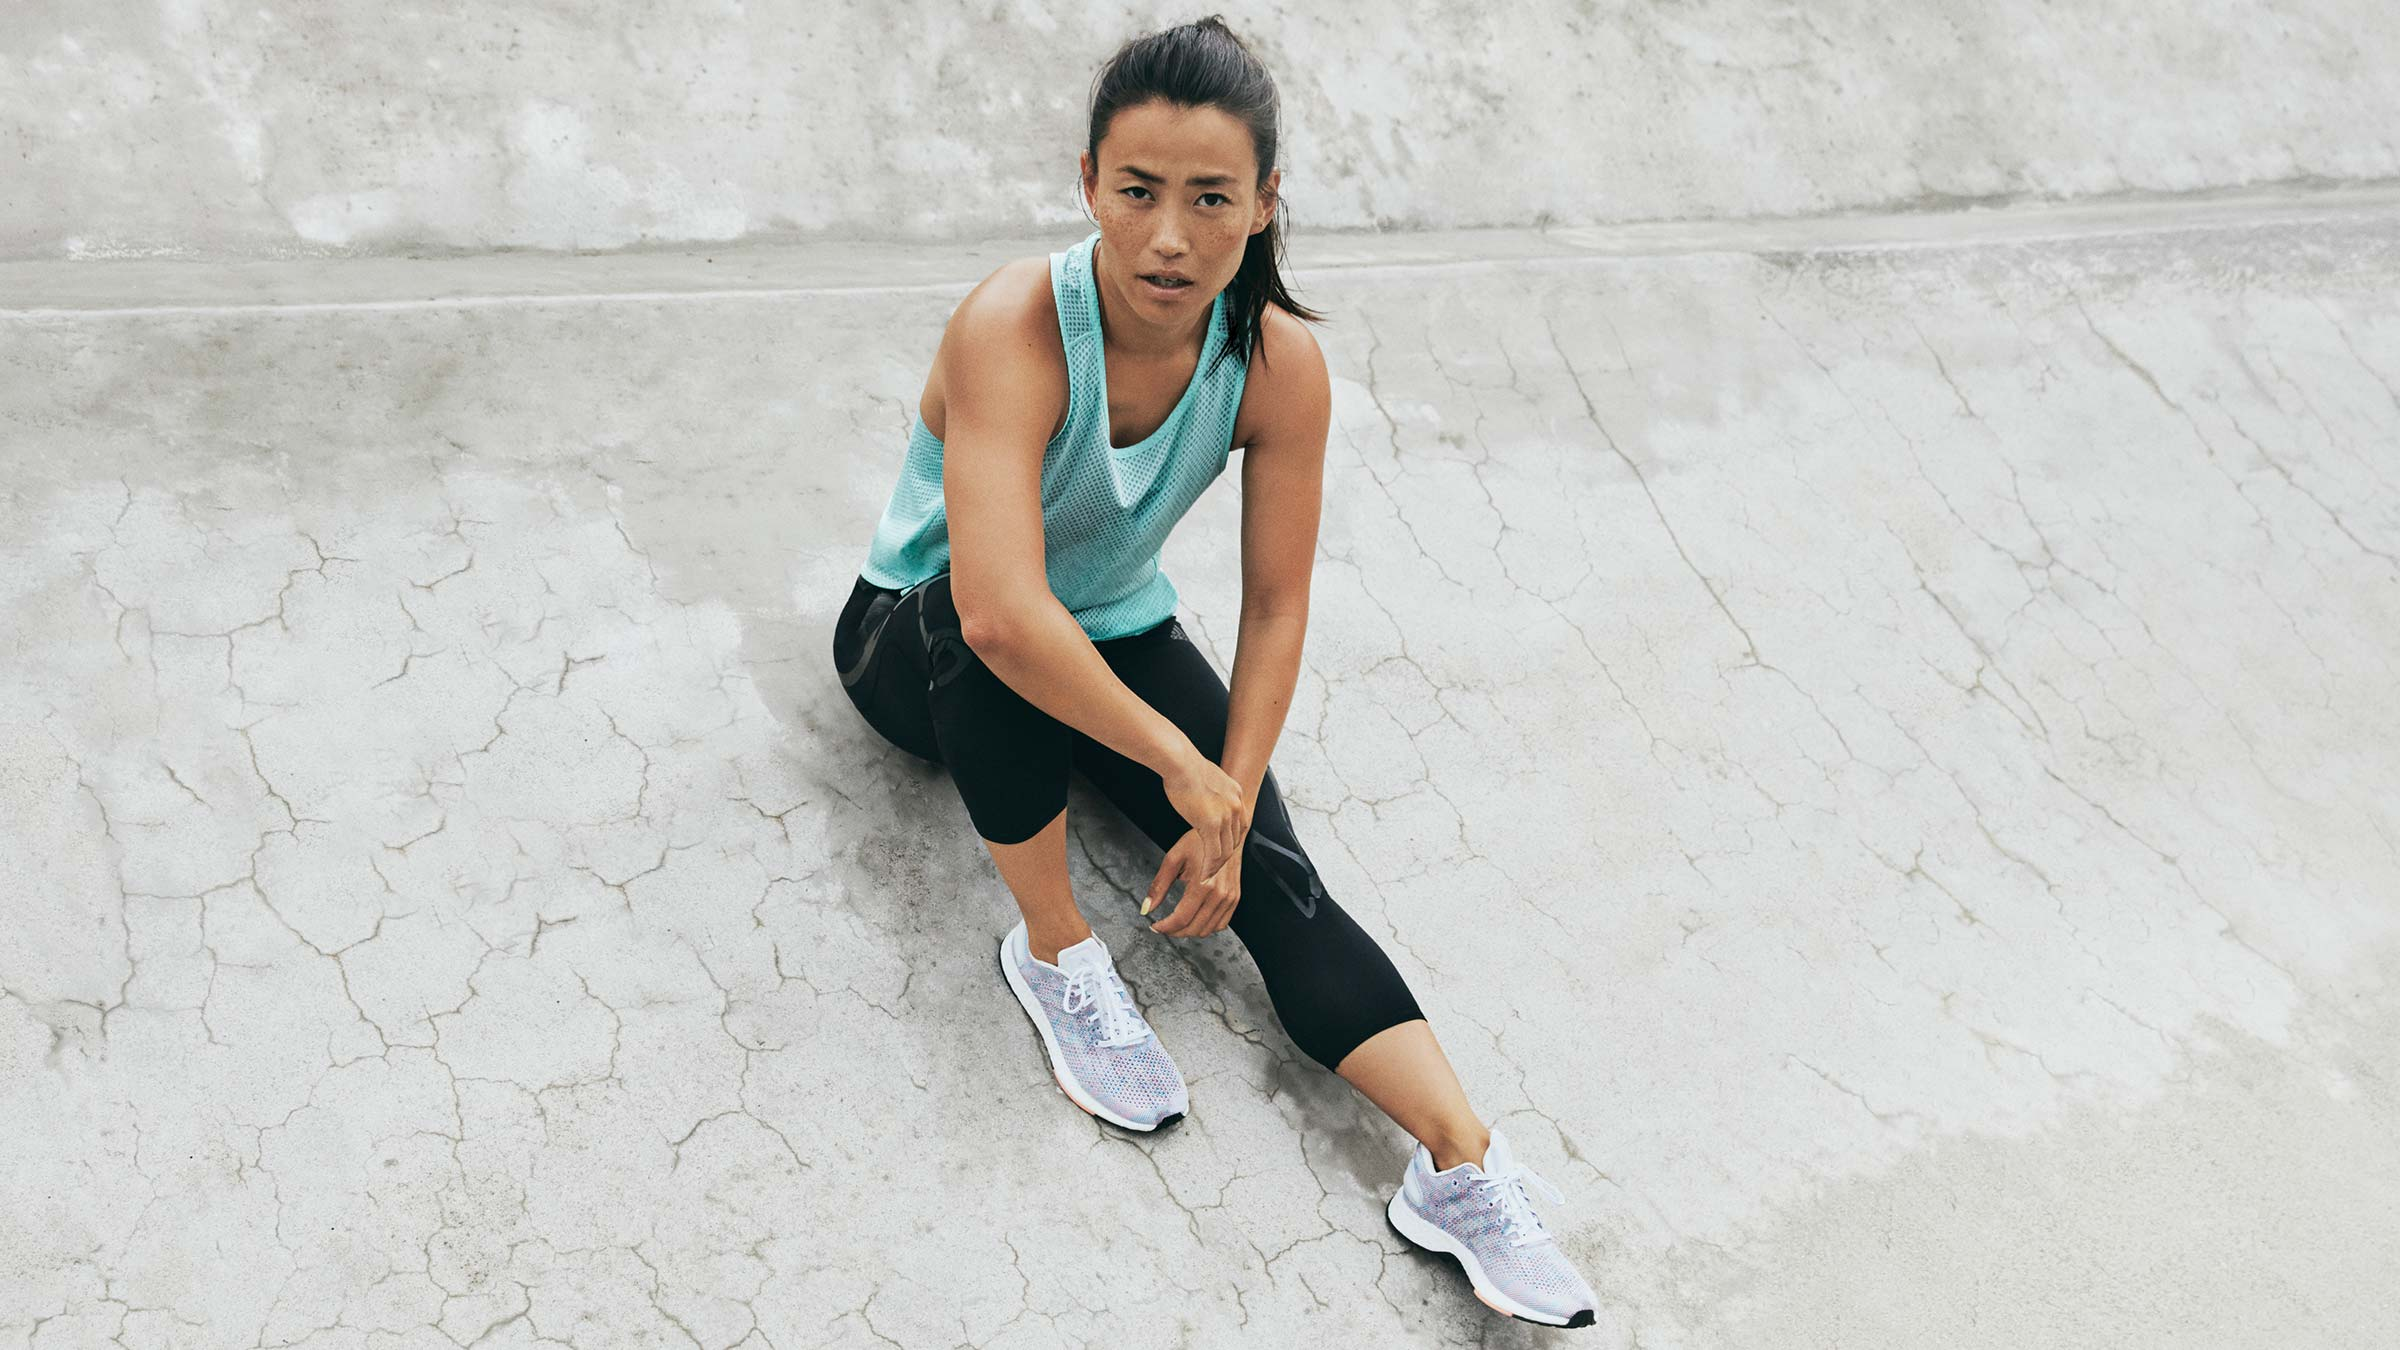 CPH_Marathon_Women_Header_Outfit_3_2400x1350